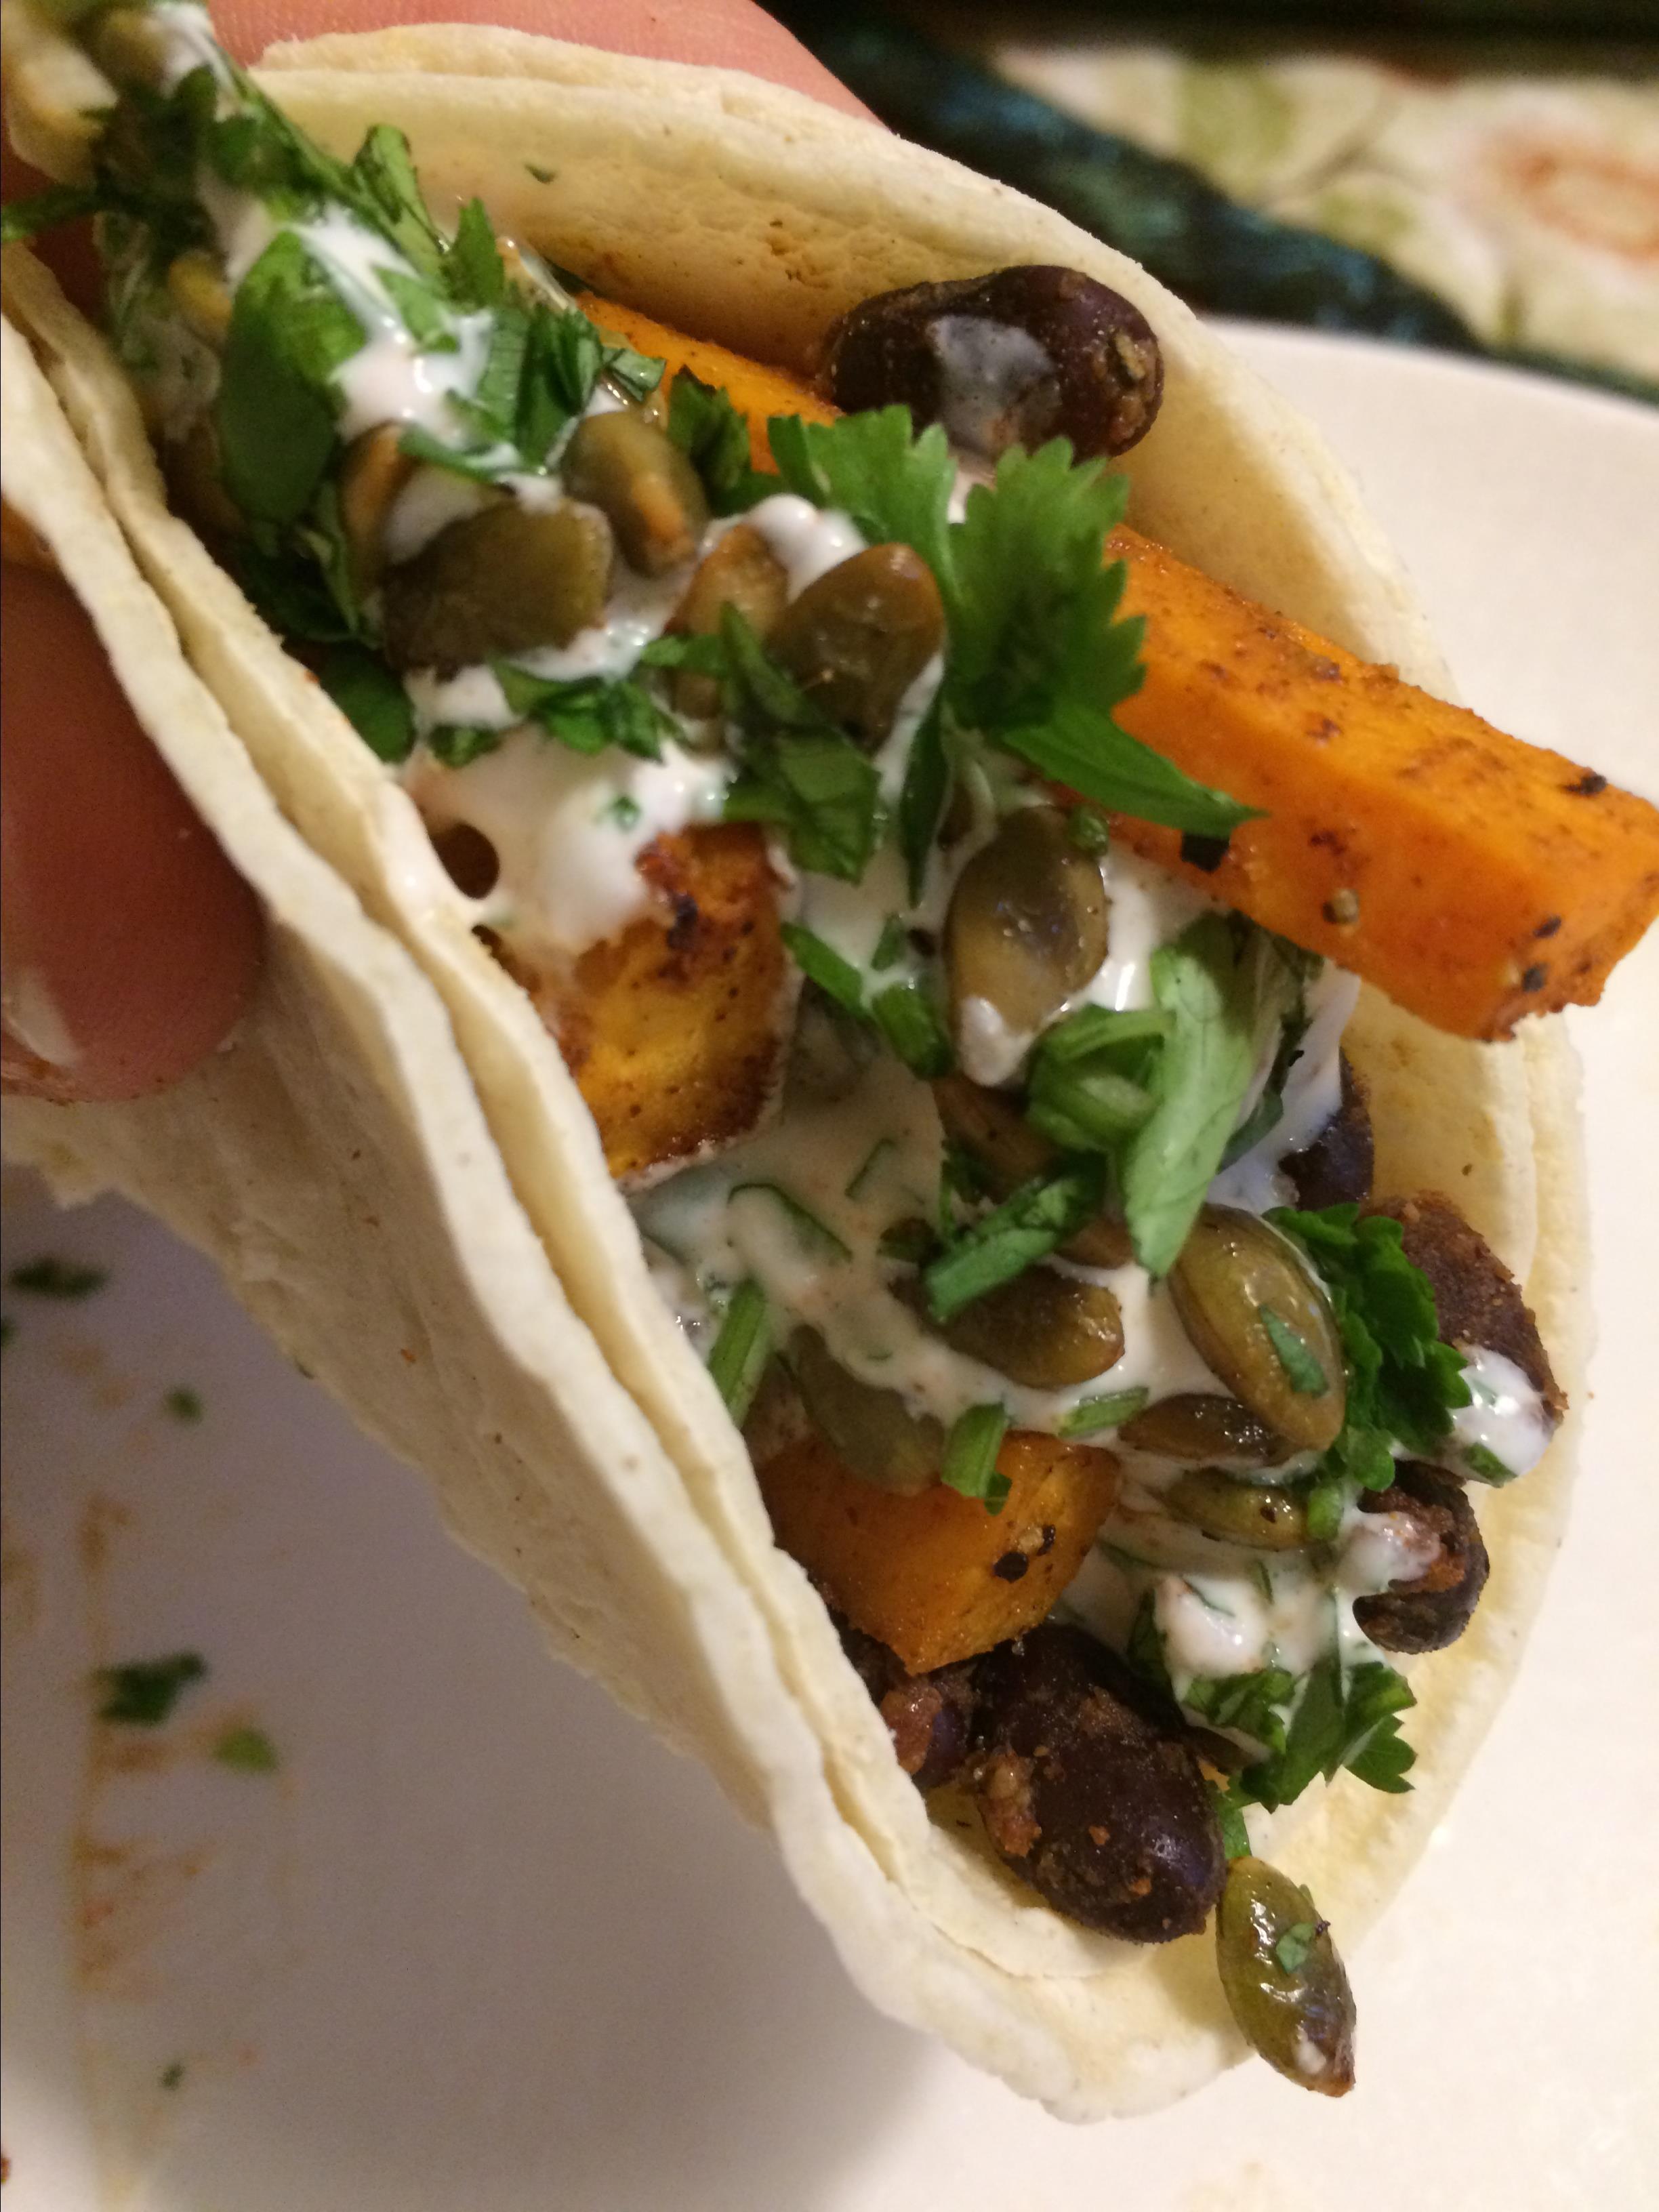 Vegan Cilantro-Lime, Sweet Potato, and Black Bean Tacos